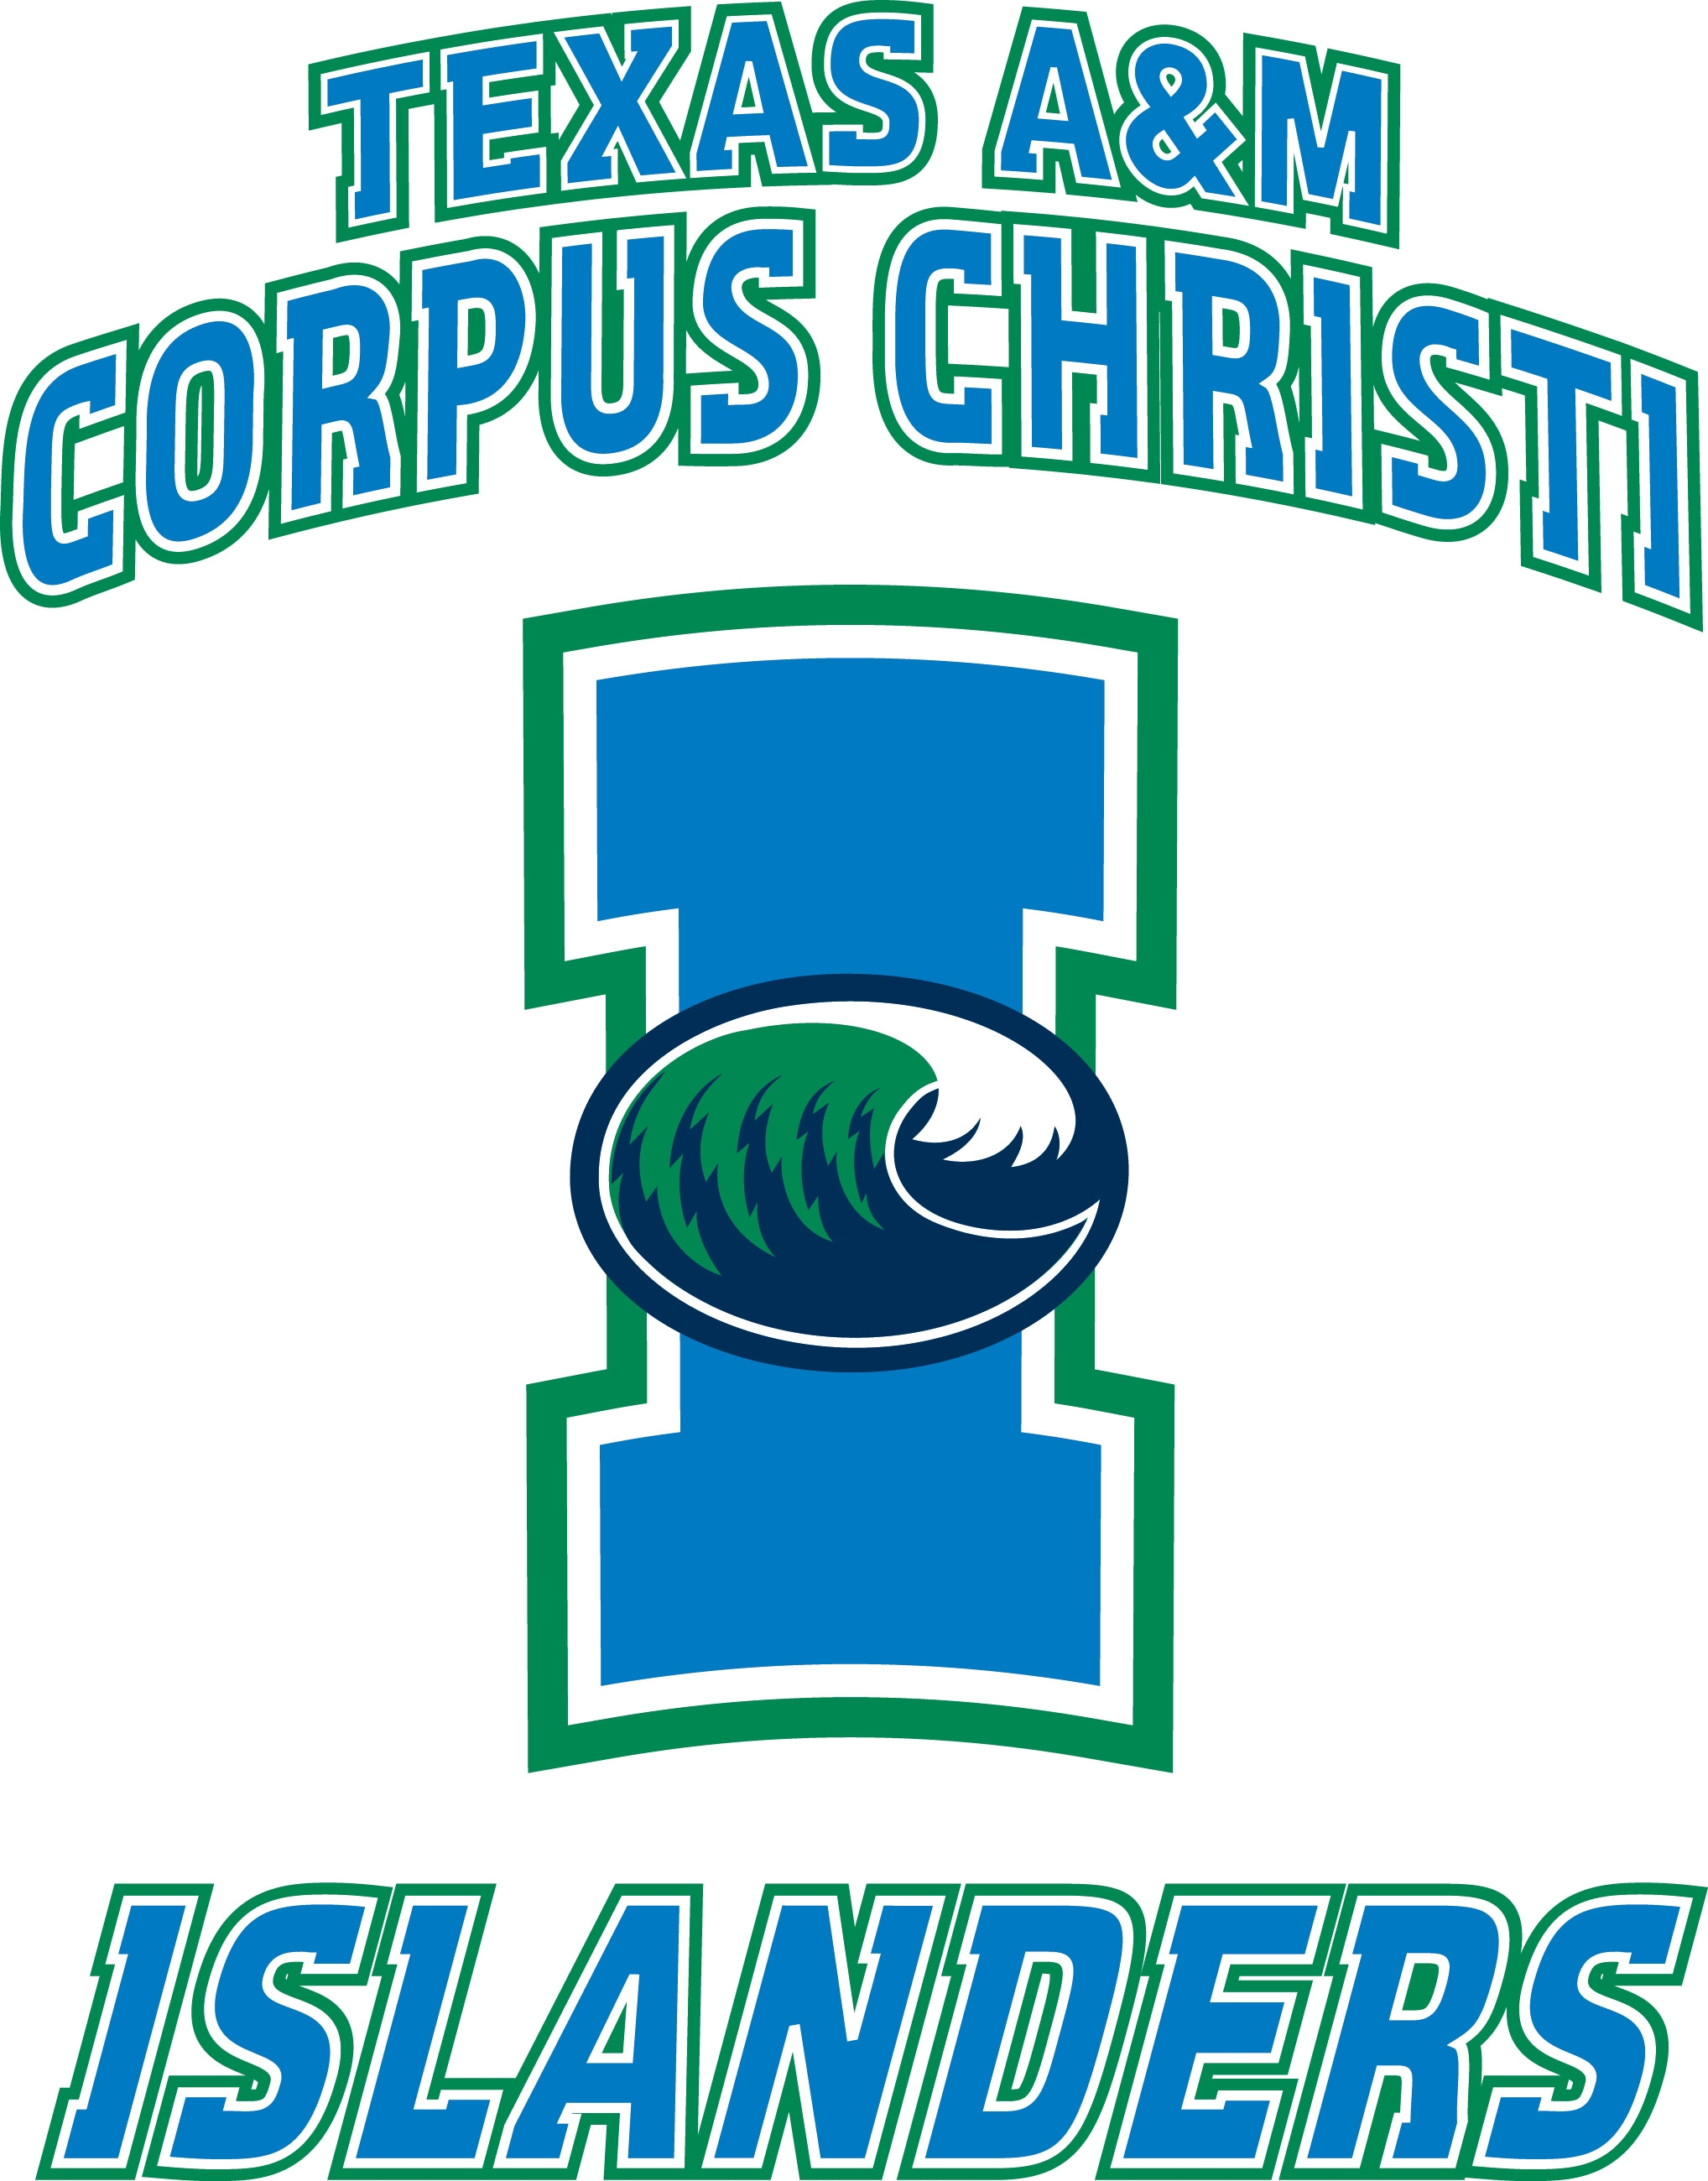 Texas A&M–Corpus Christi Islanders